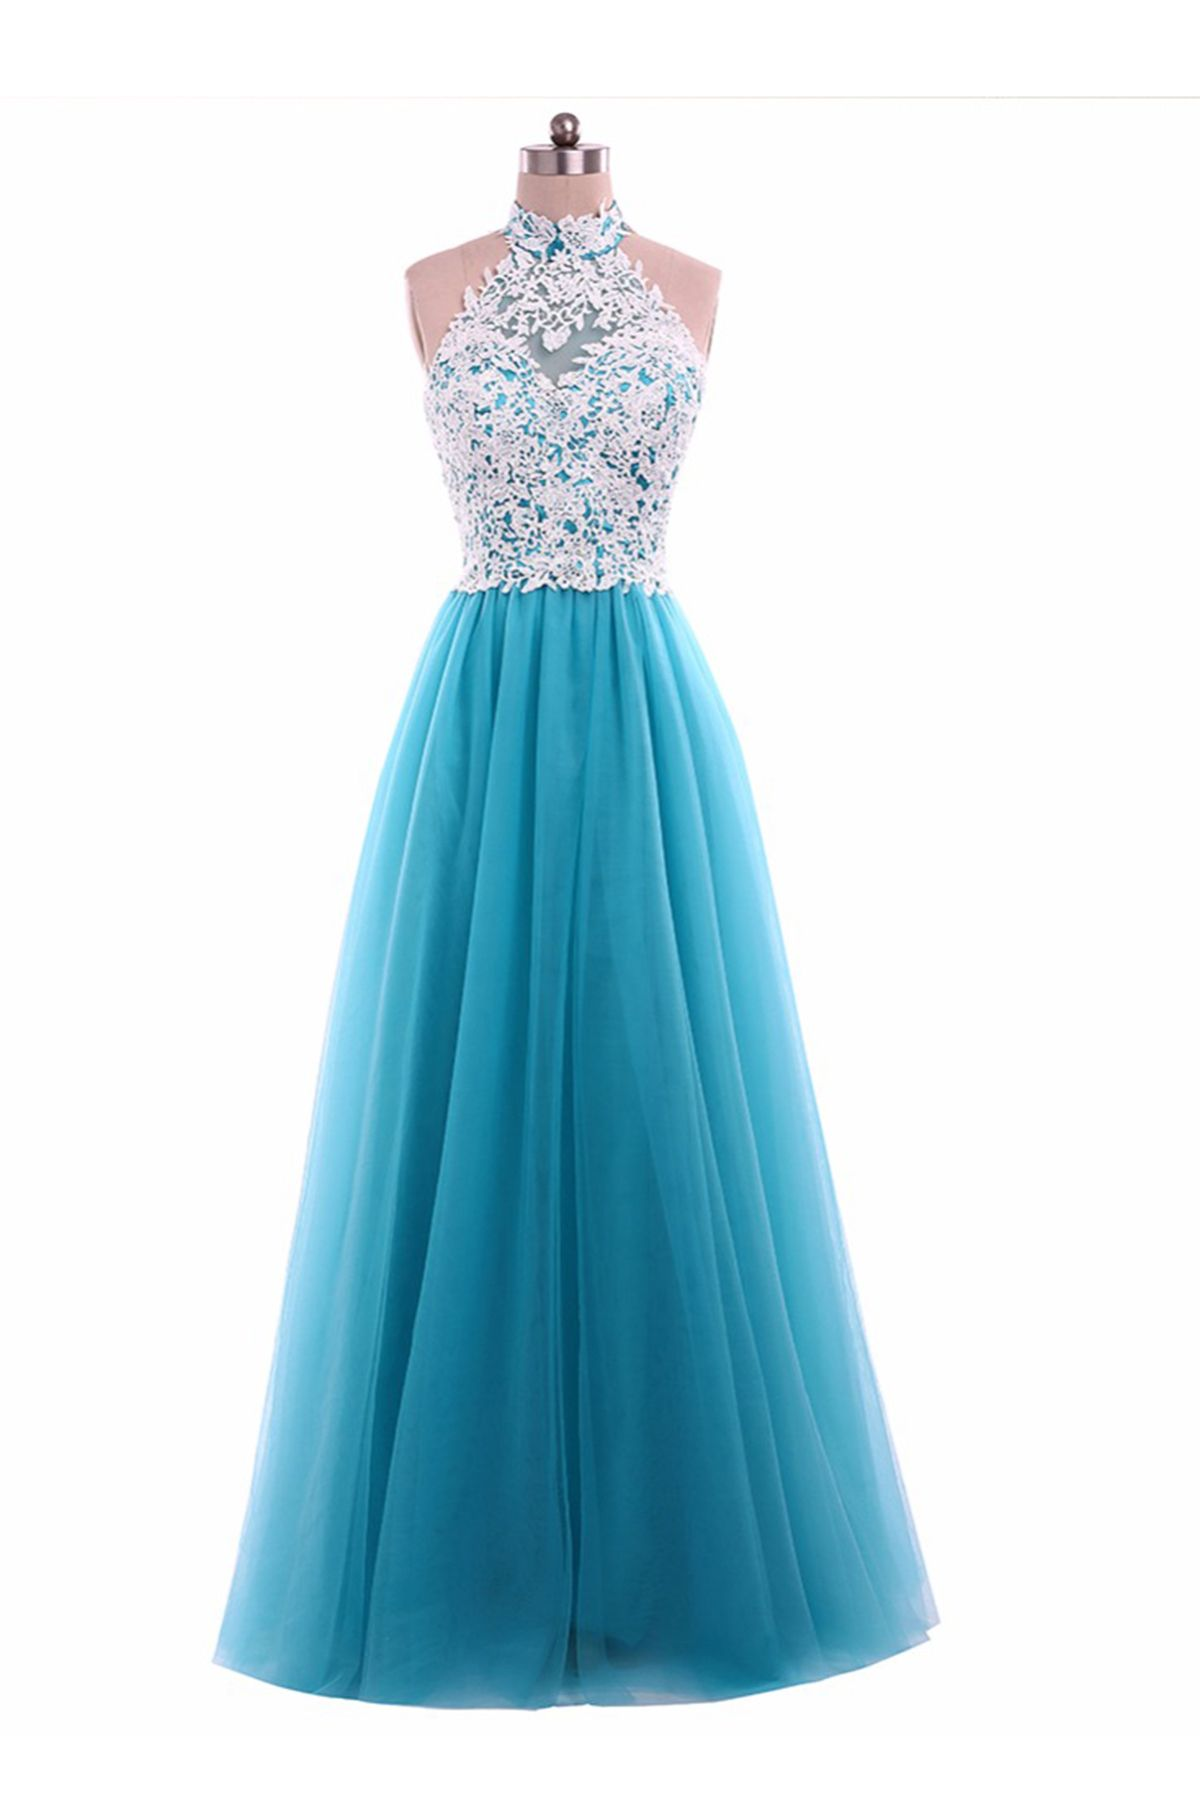 New white lace long aline senior blue prom dress halter prom dress